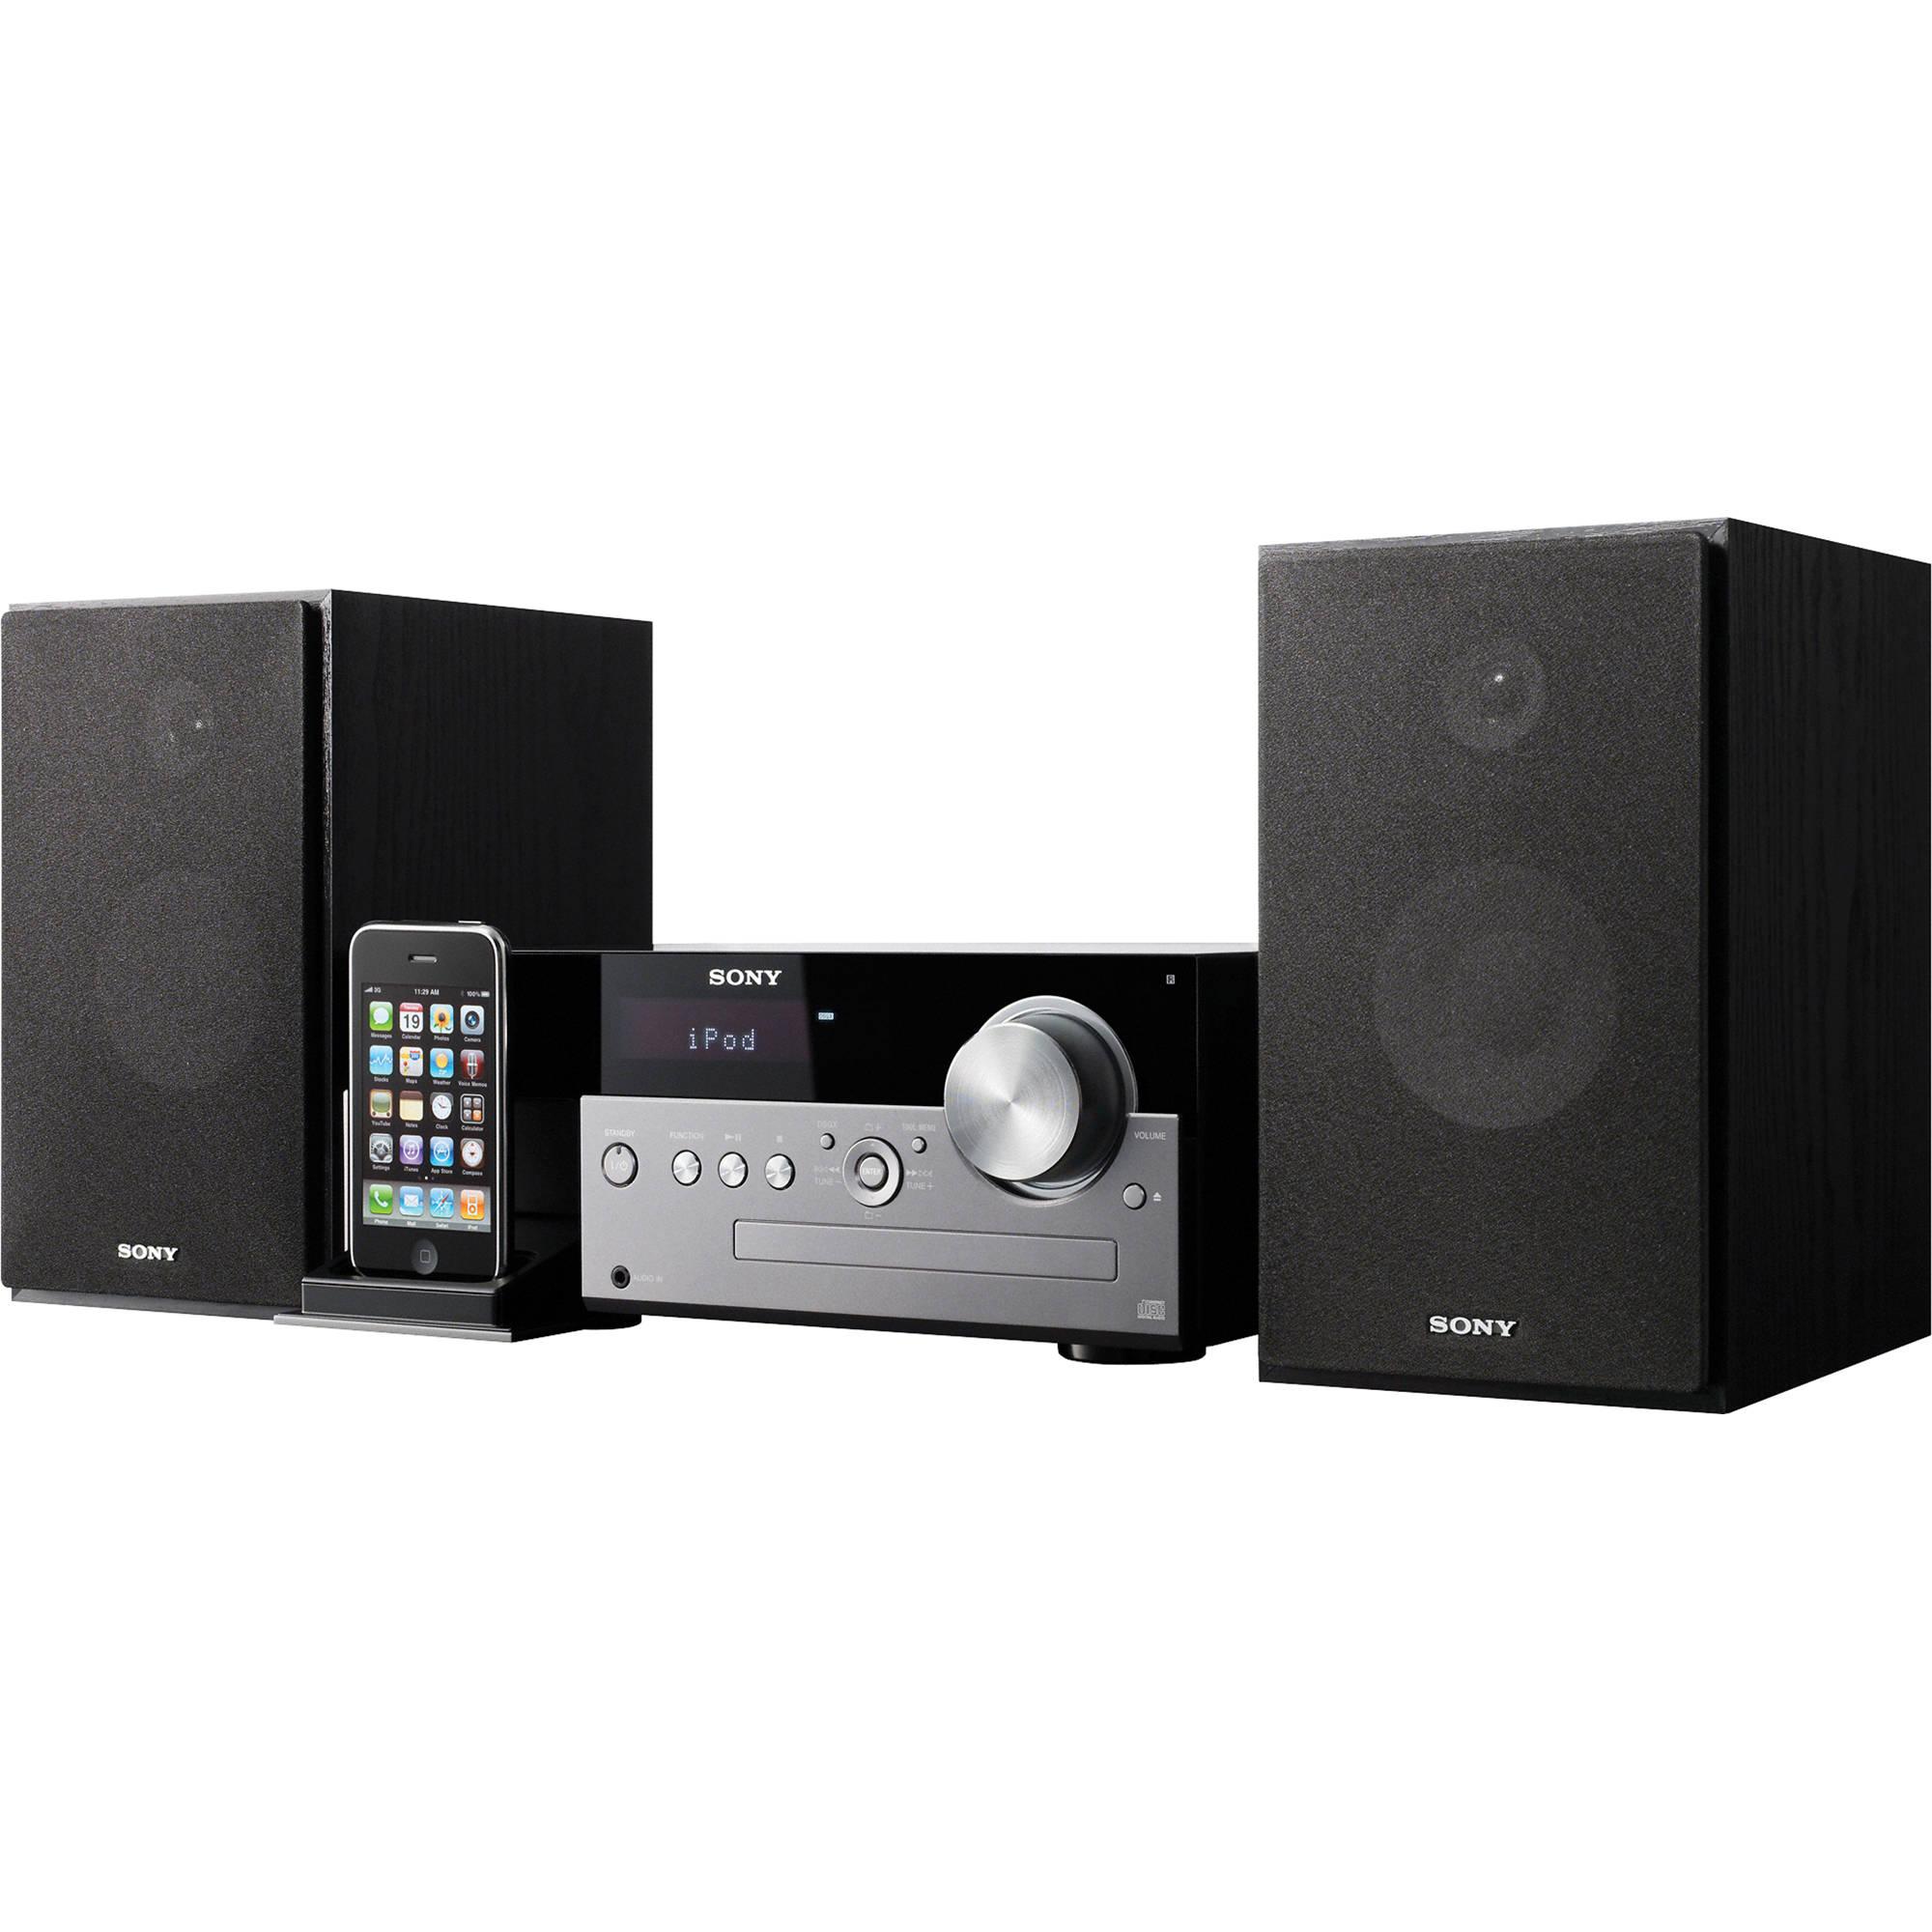 Sony Stereo Shelf System 28 Images Sony Mhc Ec909ip Mini Hi Fi Shelf System Sarinas Rewards